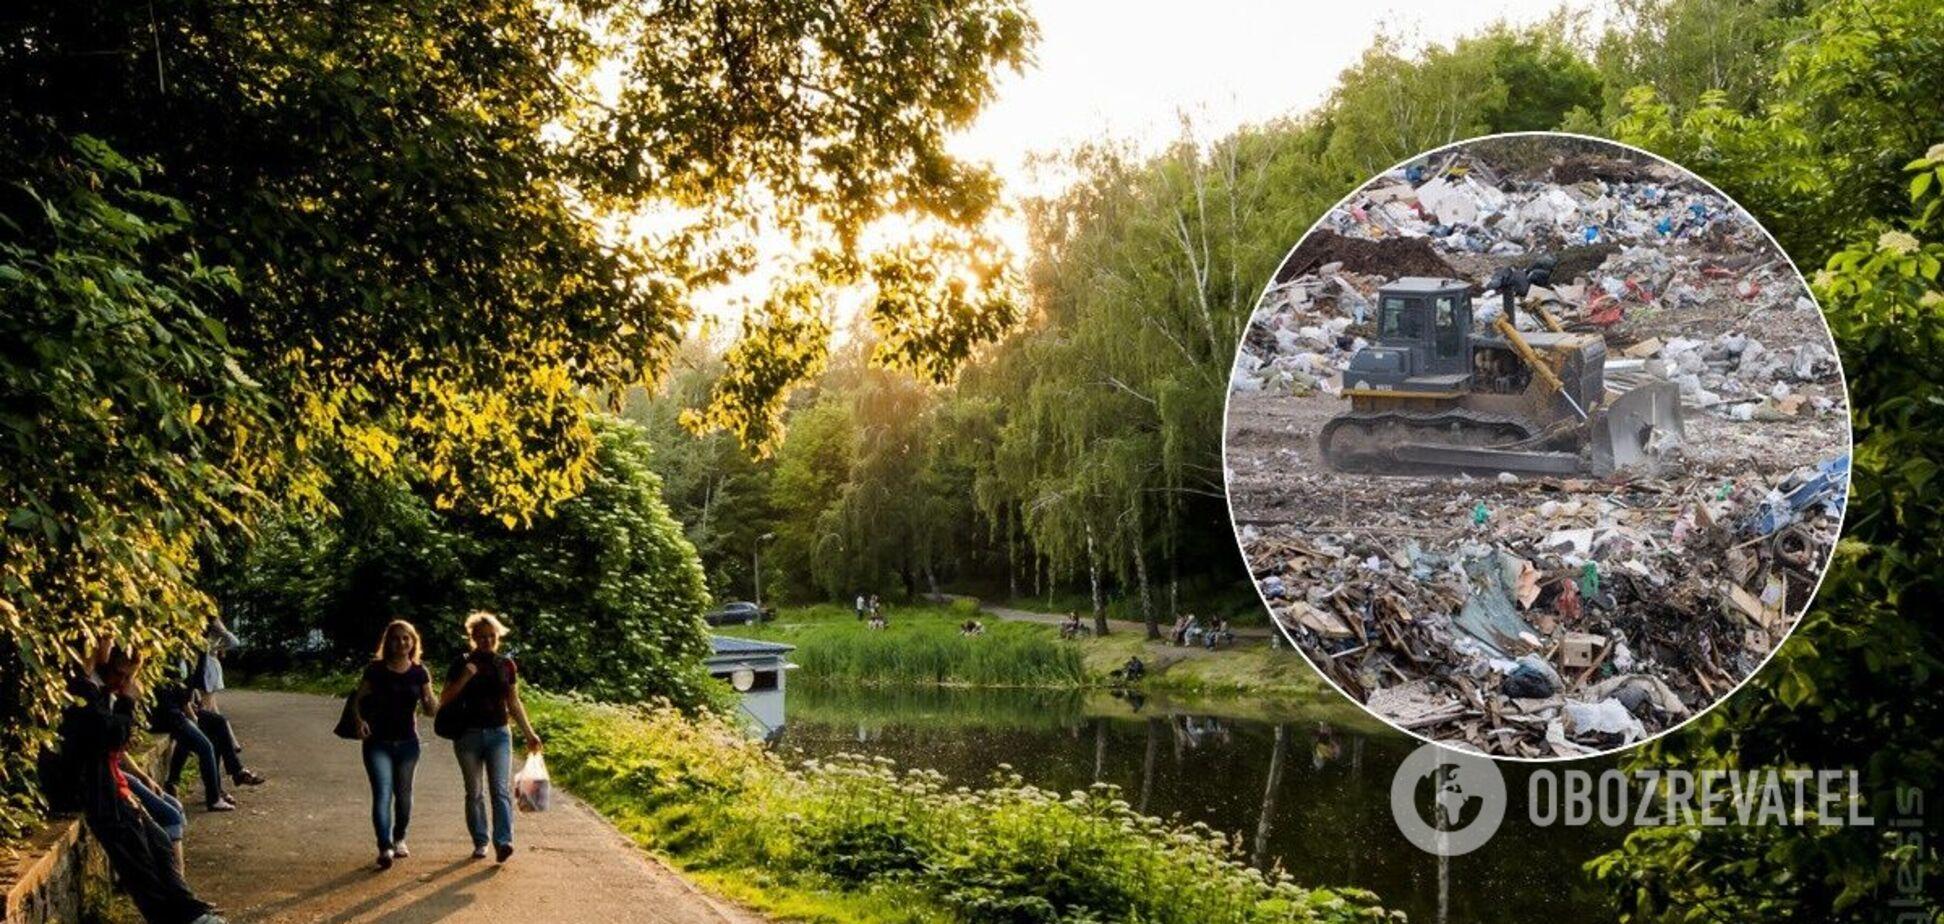 Предусмотрена очистка загрязненных территорий